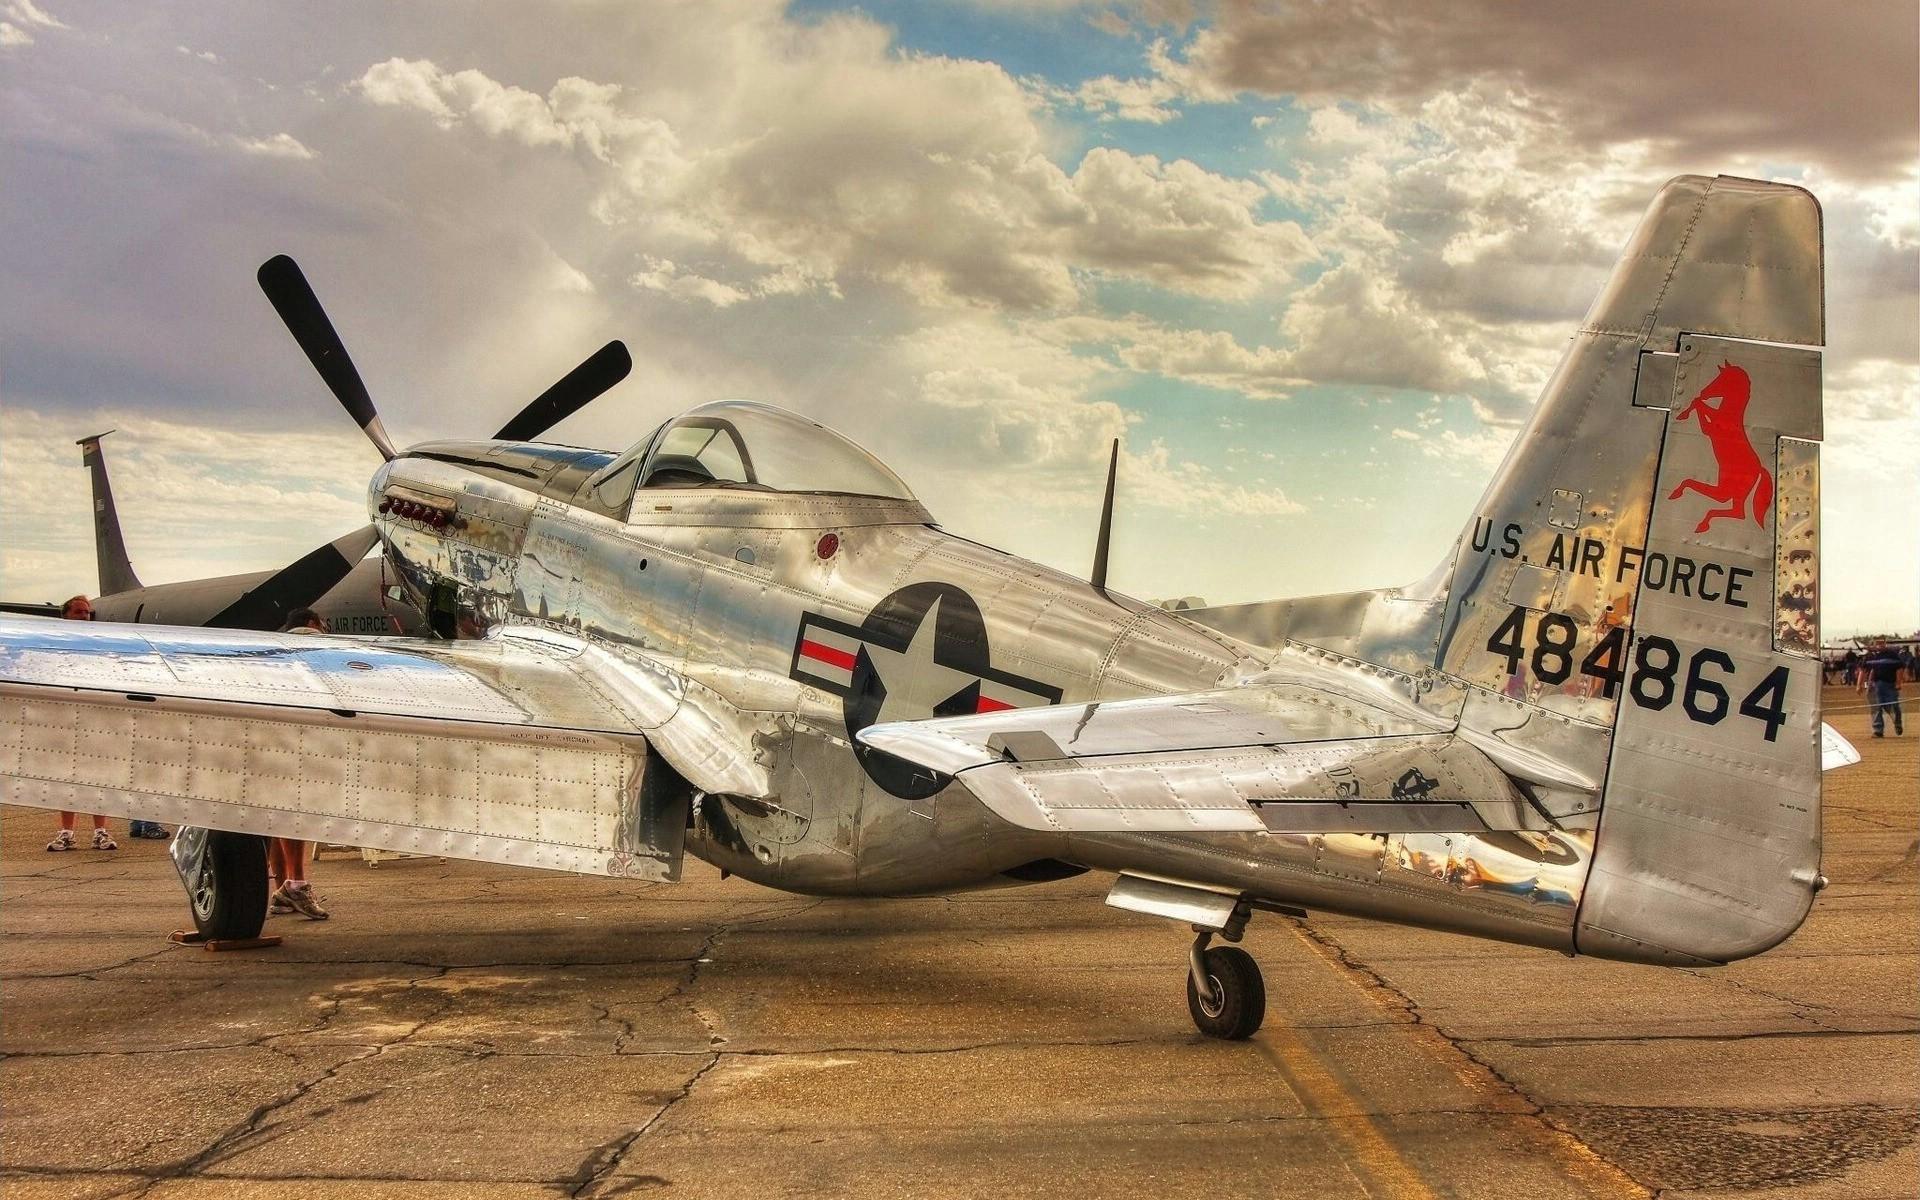 Vintage Airplane US Air Force Wallpapers 1920x1200